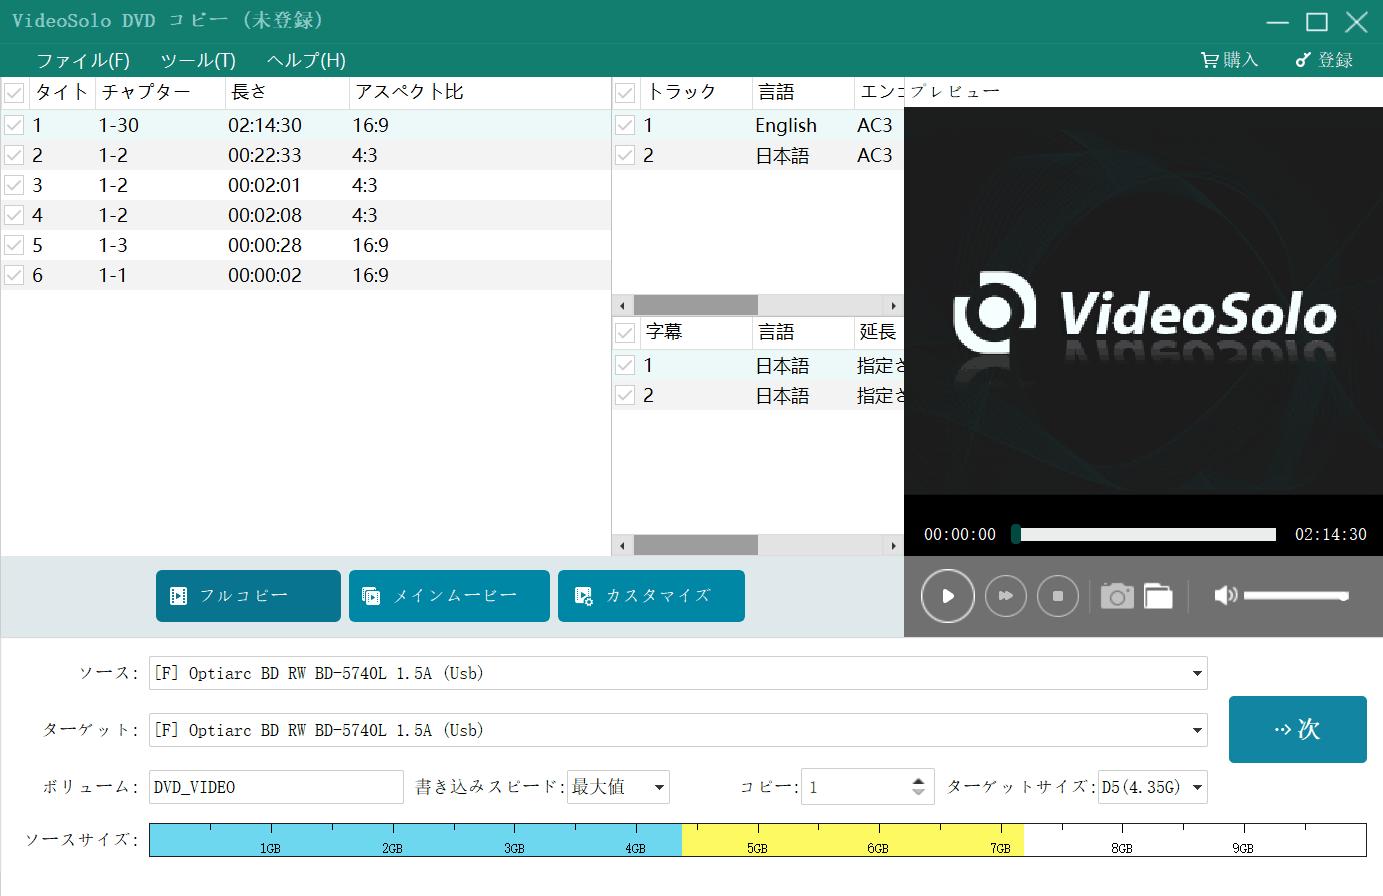 DVDコピーモードを選択